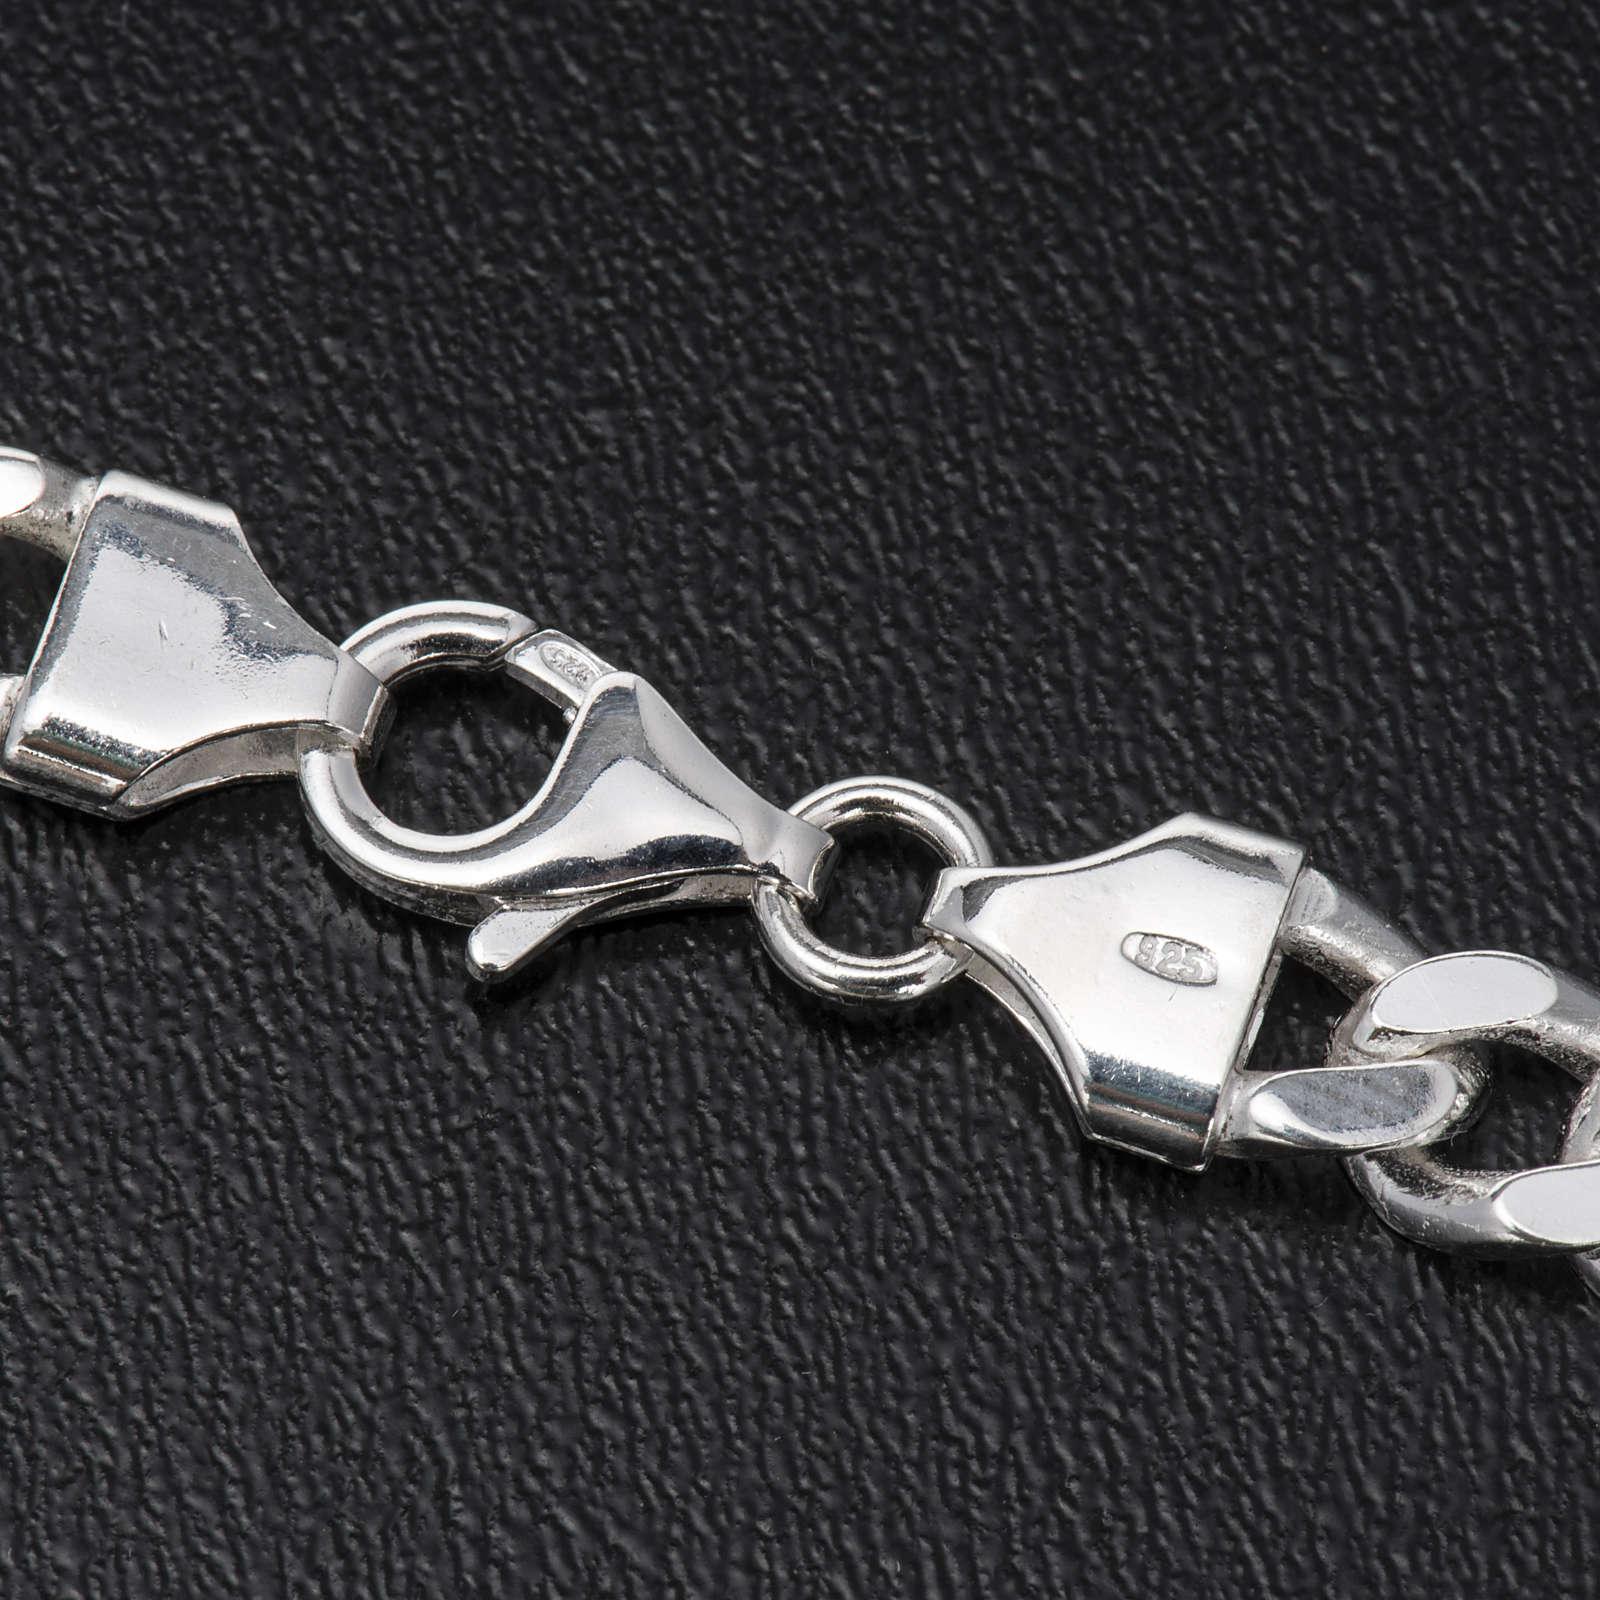 Cadena para cruz pectoral plata 925 - 90 cm. 2 lados 3